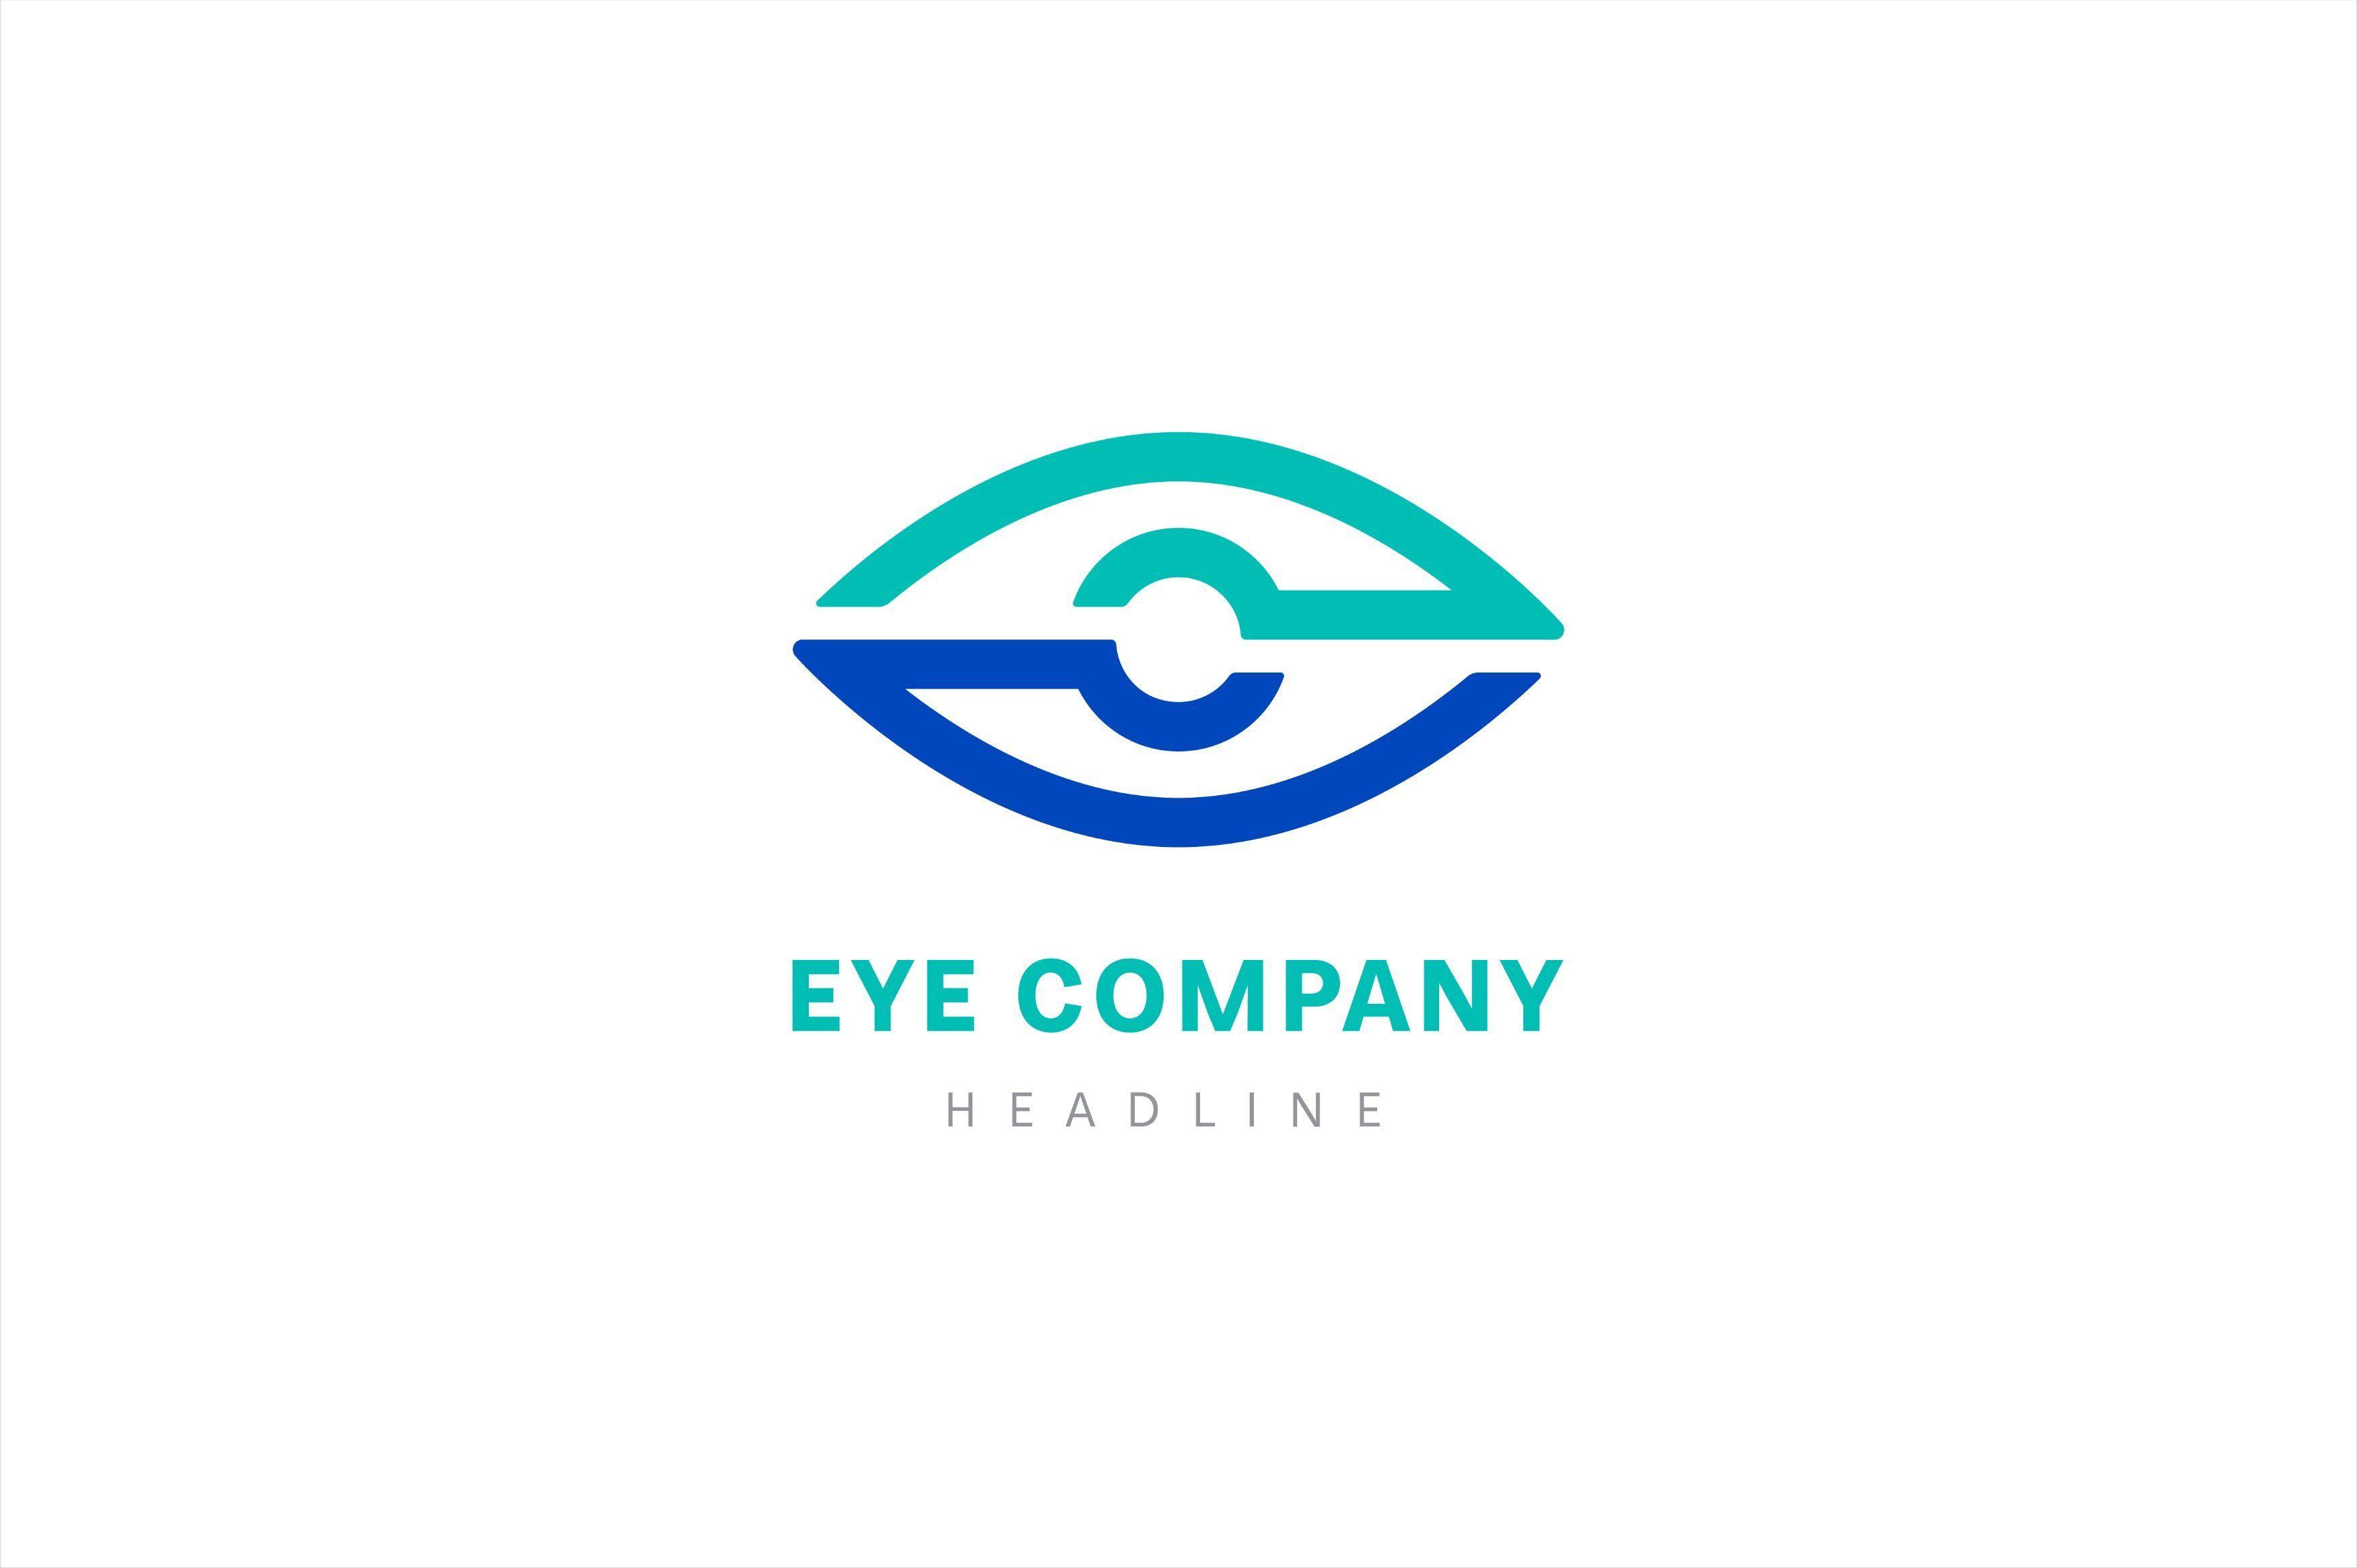 Eye company logo template Corporate logo design, Logo